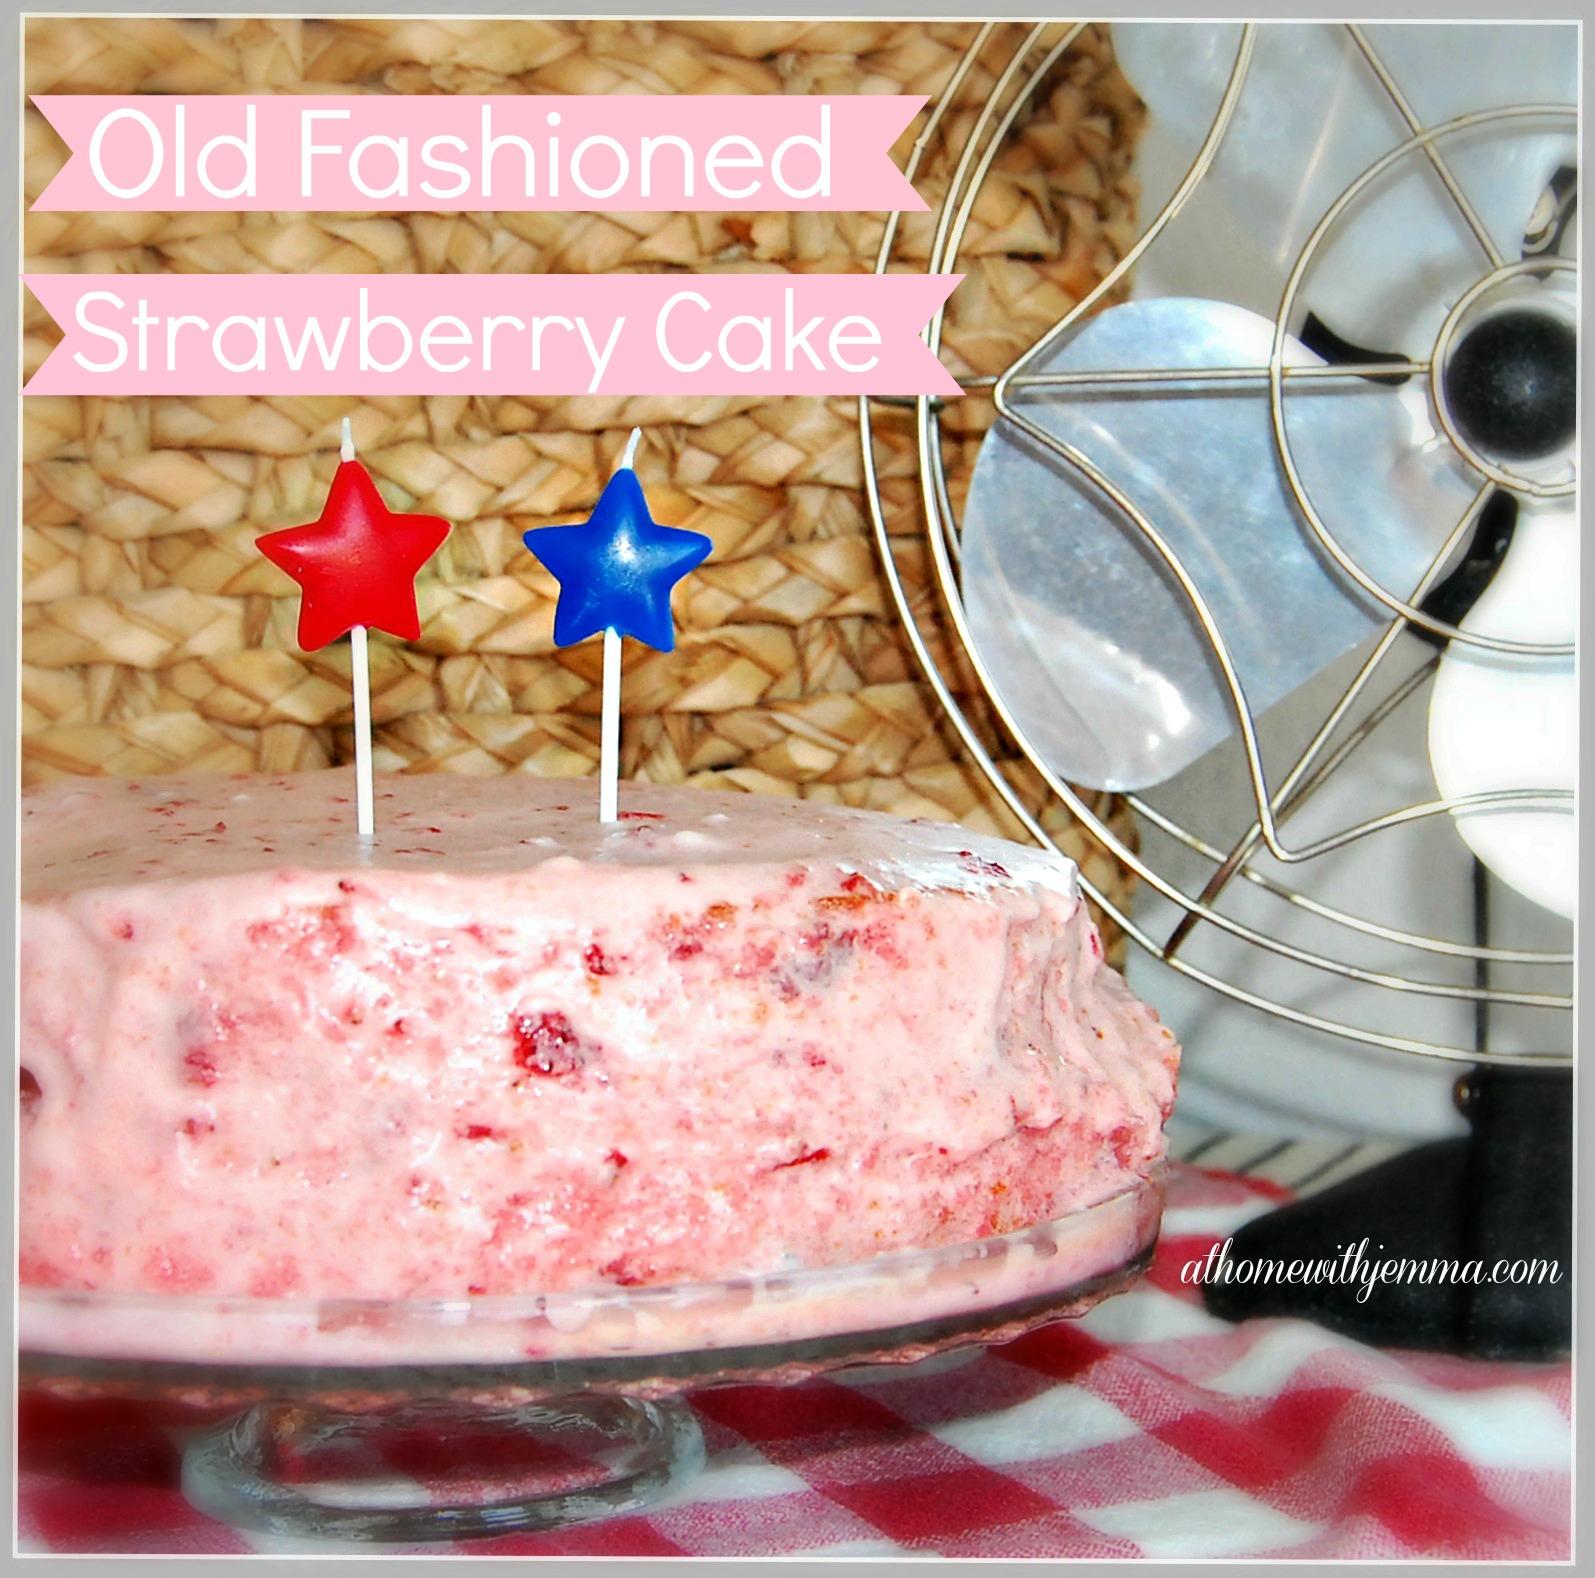 recipe-cake-strawberry-oldfashioned-athomewithjemma